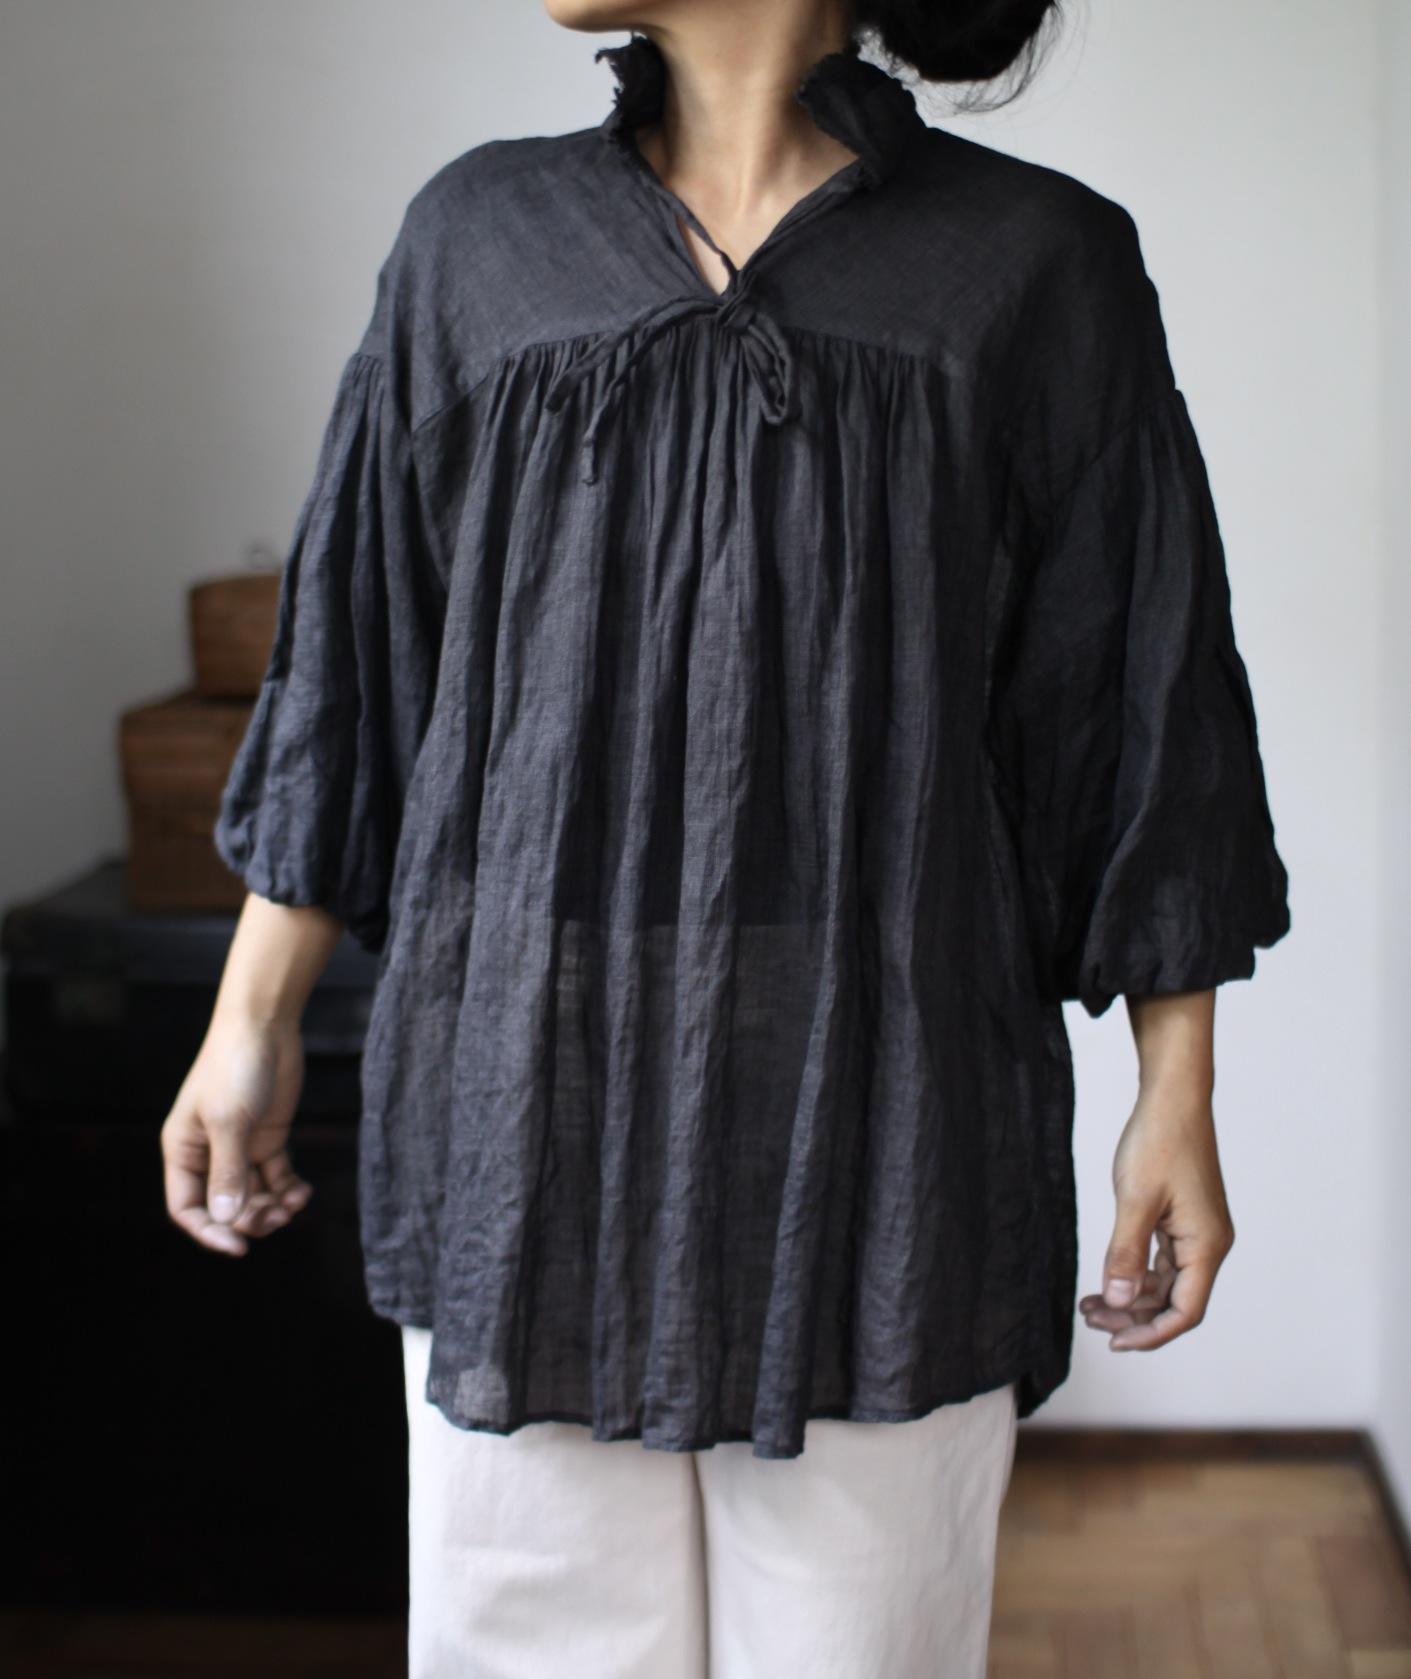 2015 Spring/Summer リネンシングルガーゼのブラウス Linen gauze blouse(B-1531)墨